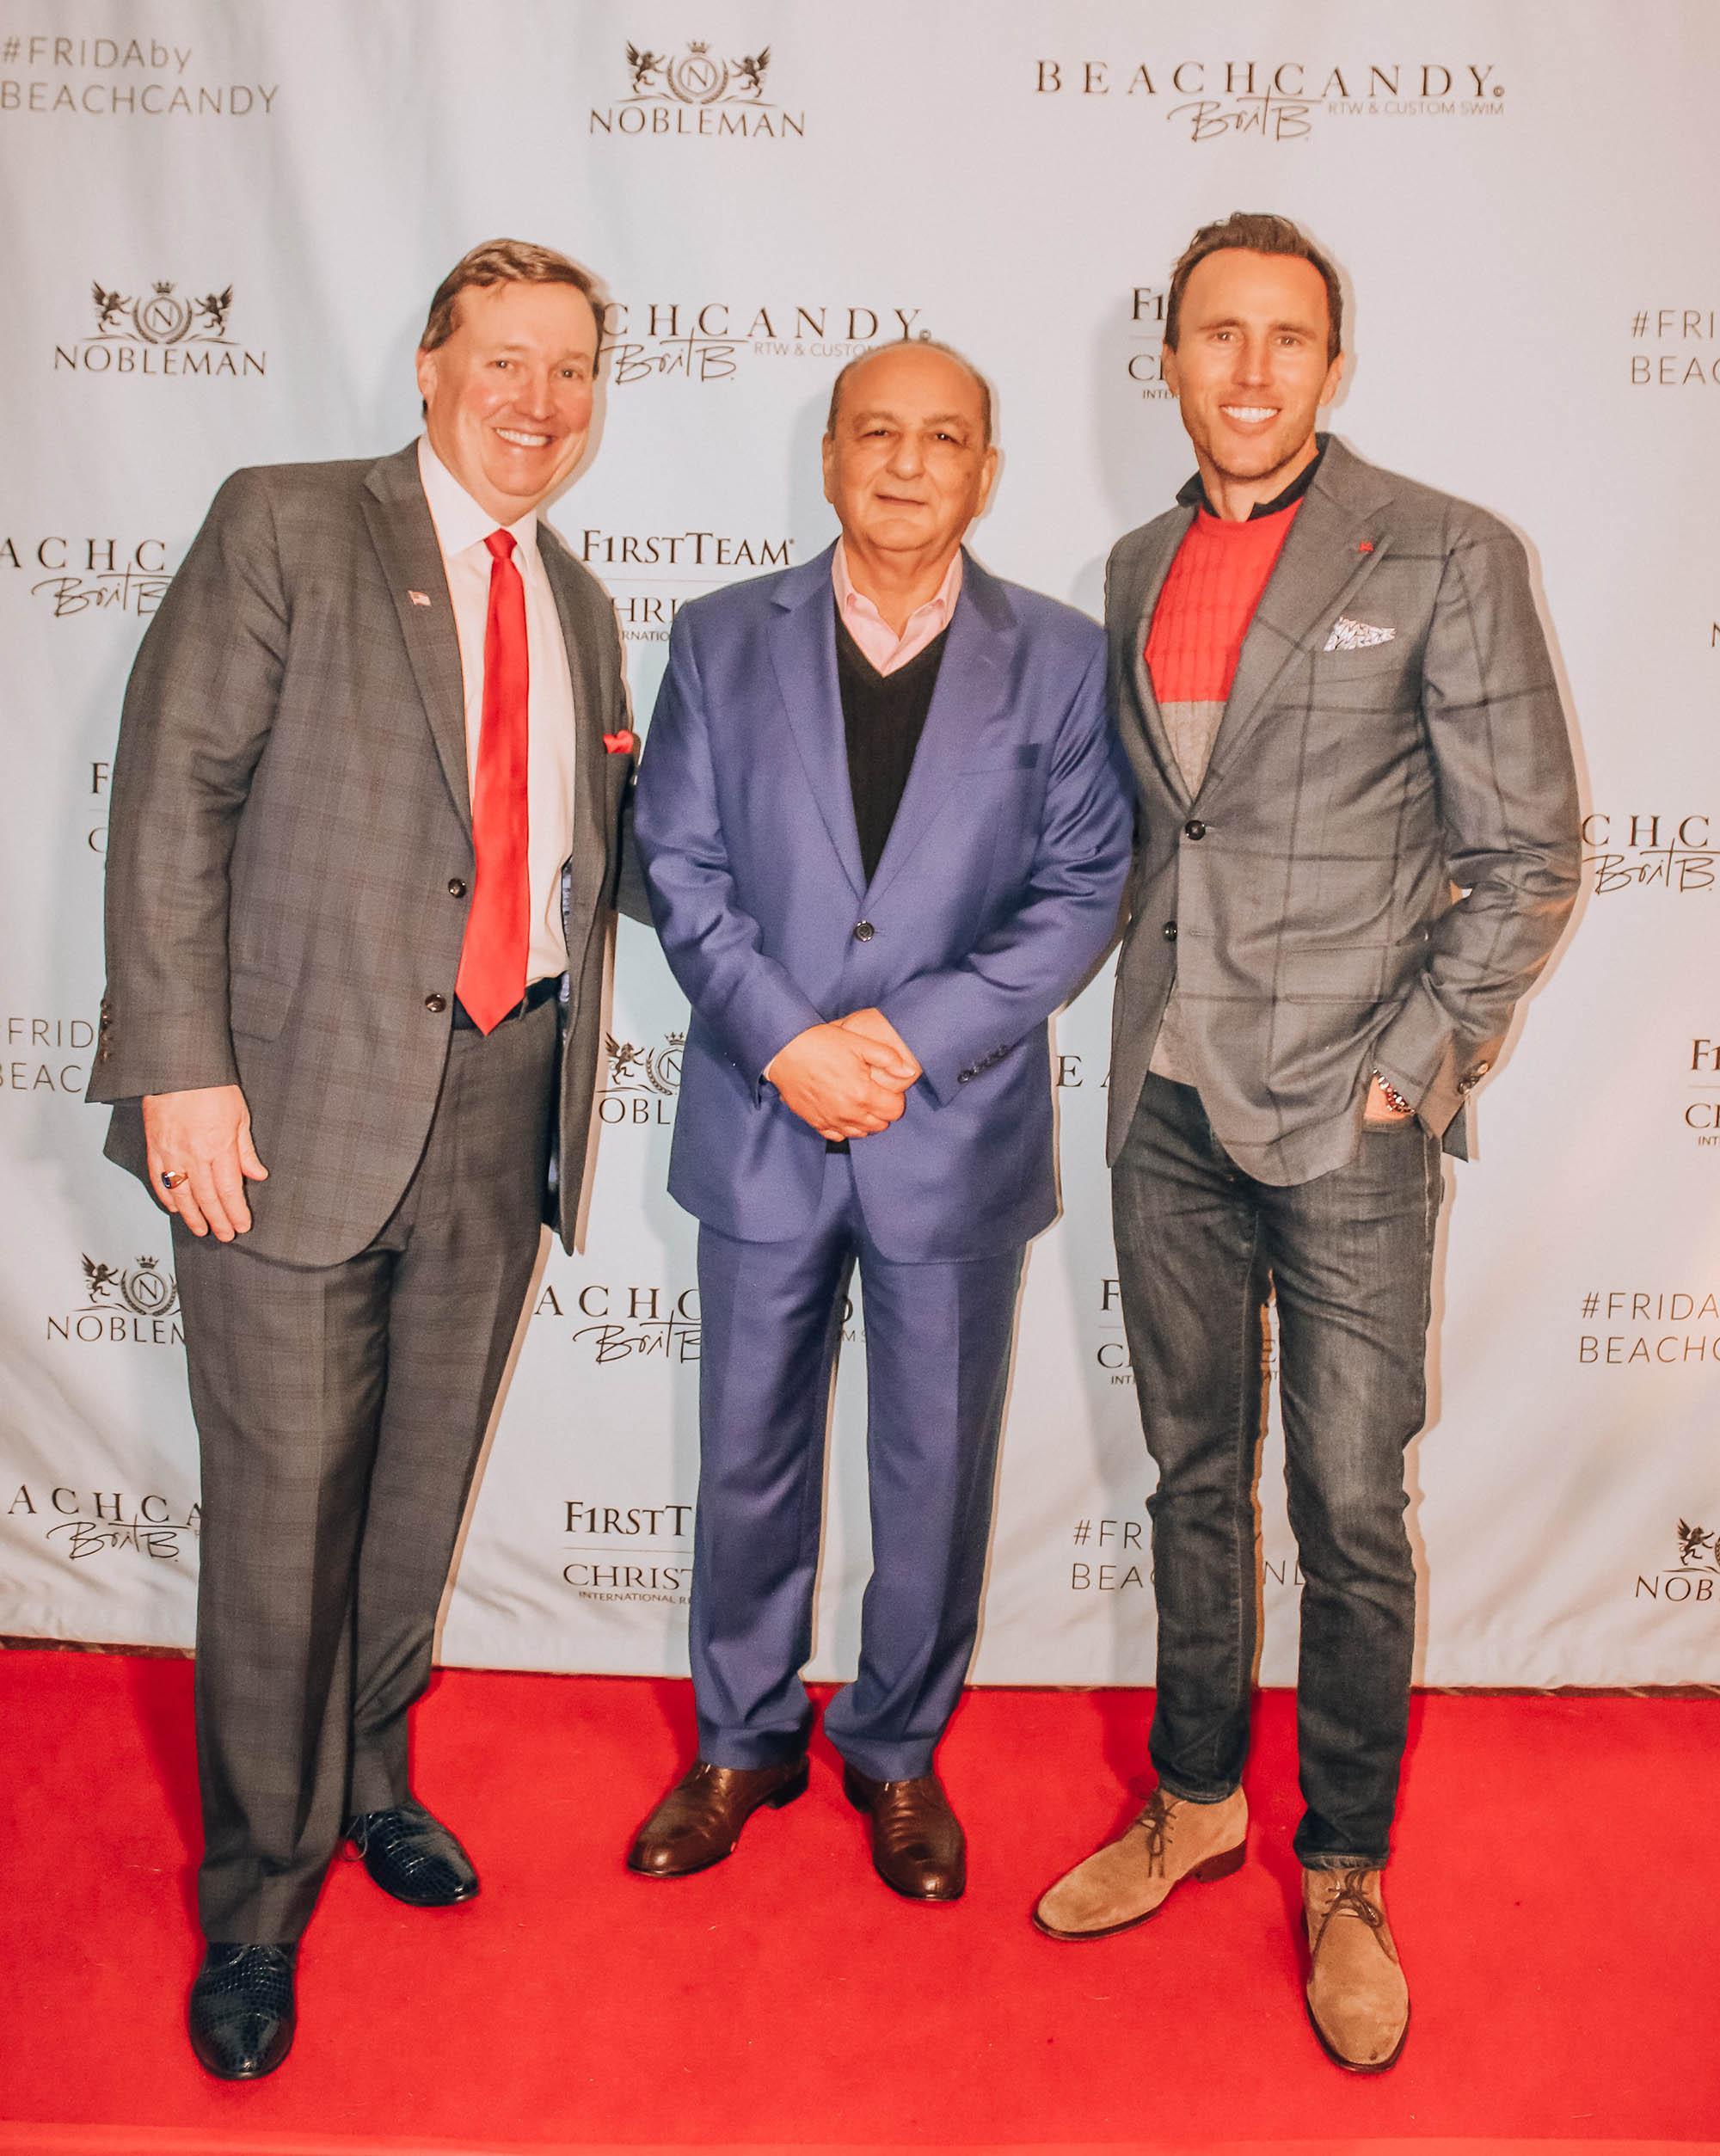 First Team Christie's International Hosts High-End Luxury Brands at Beach Candy Fashion Event